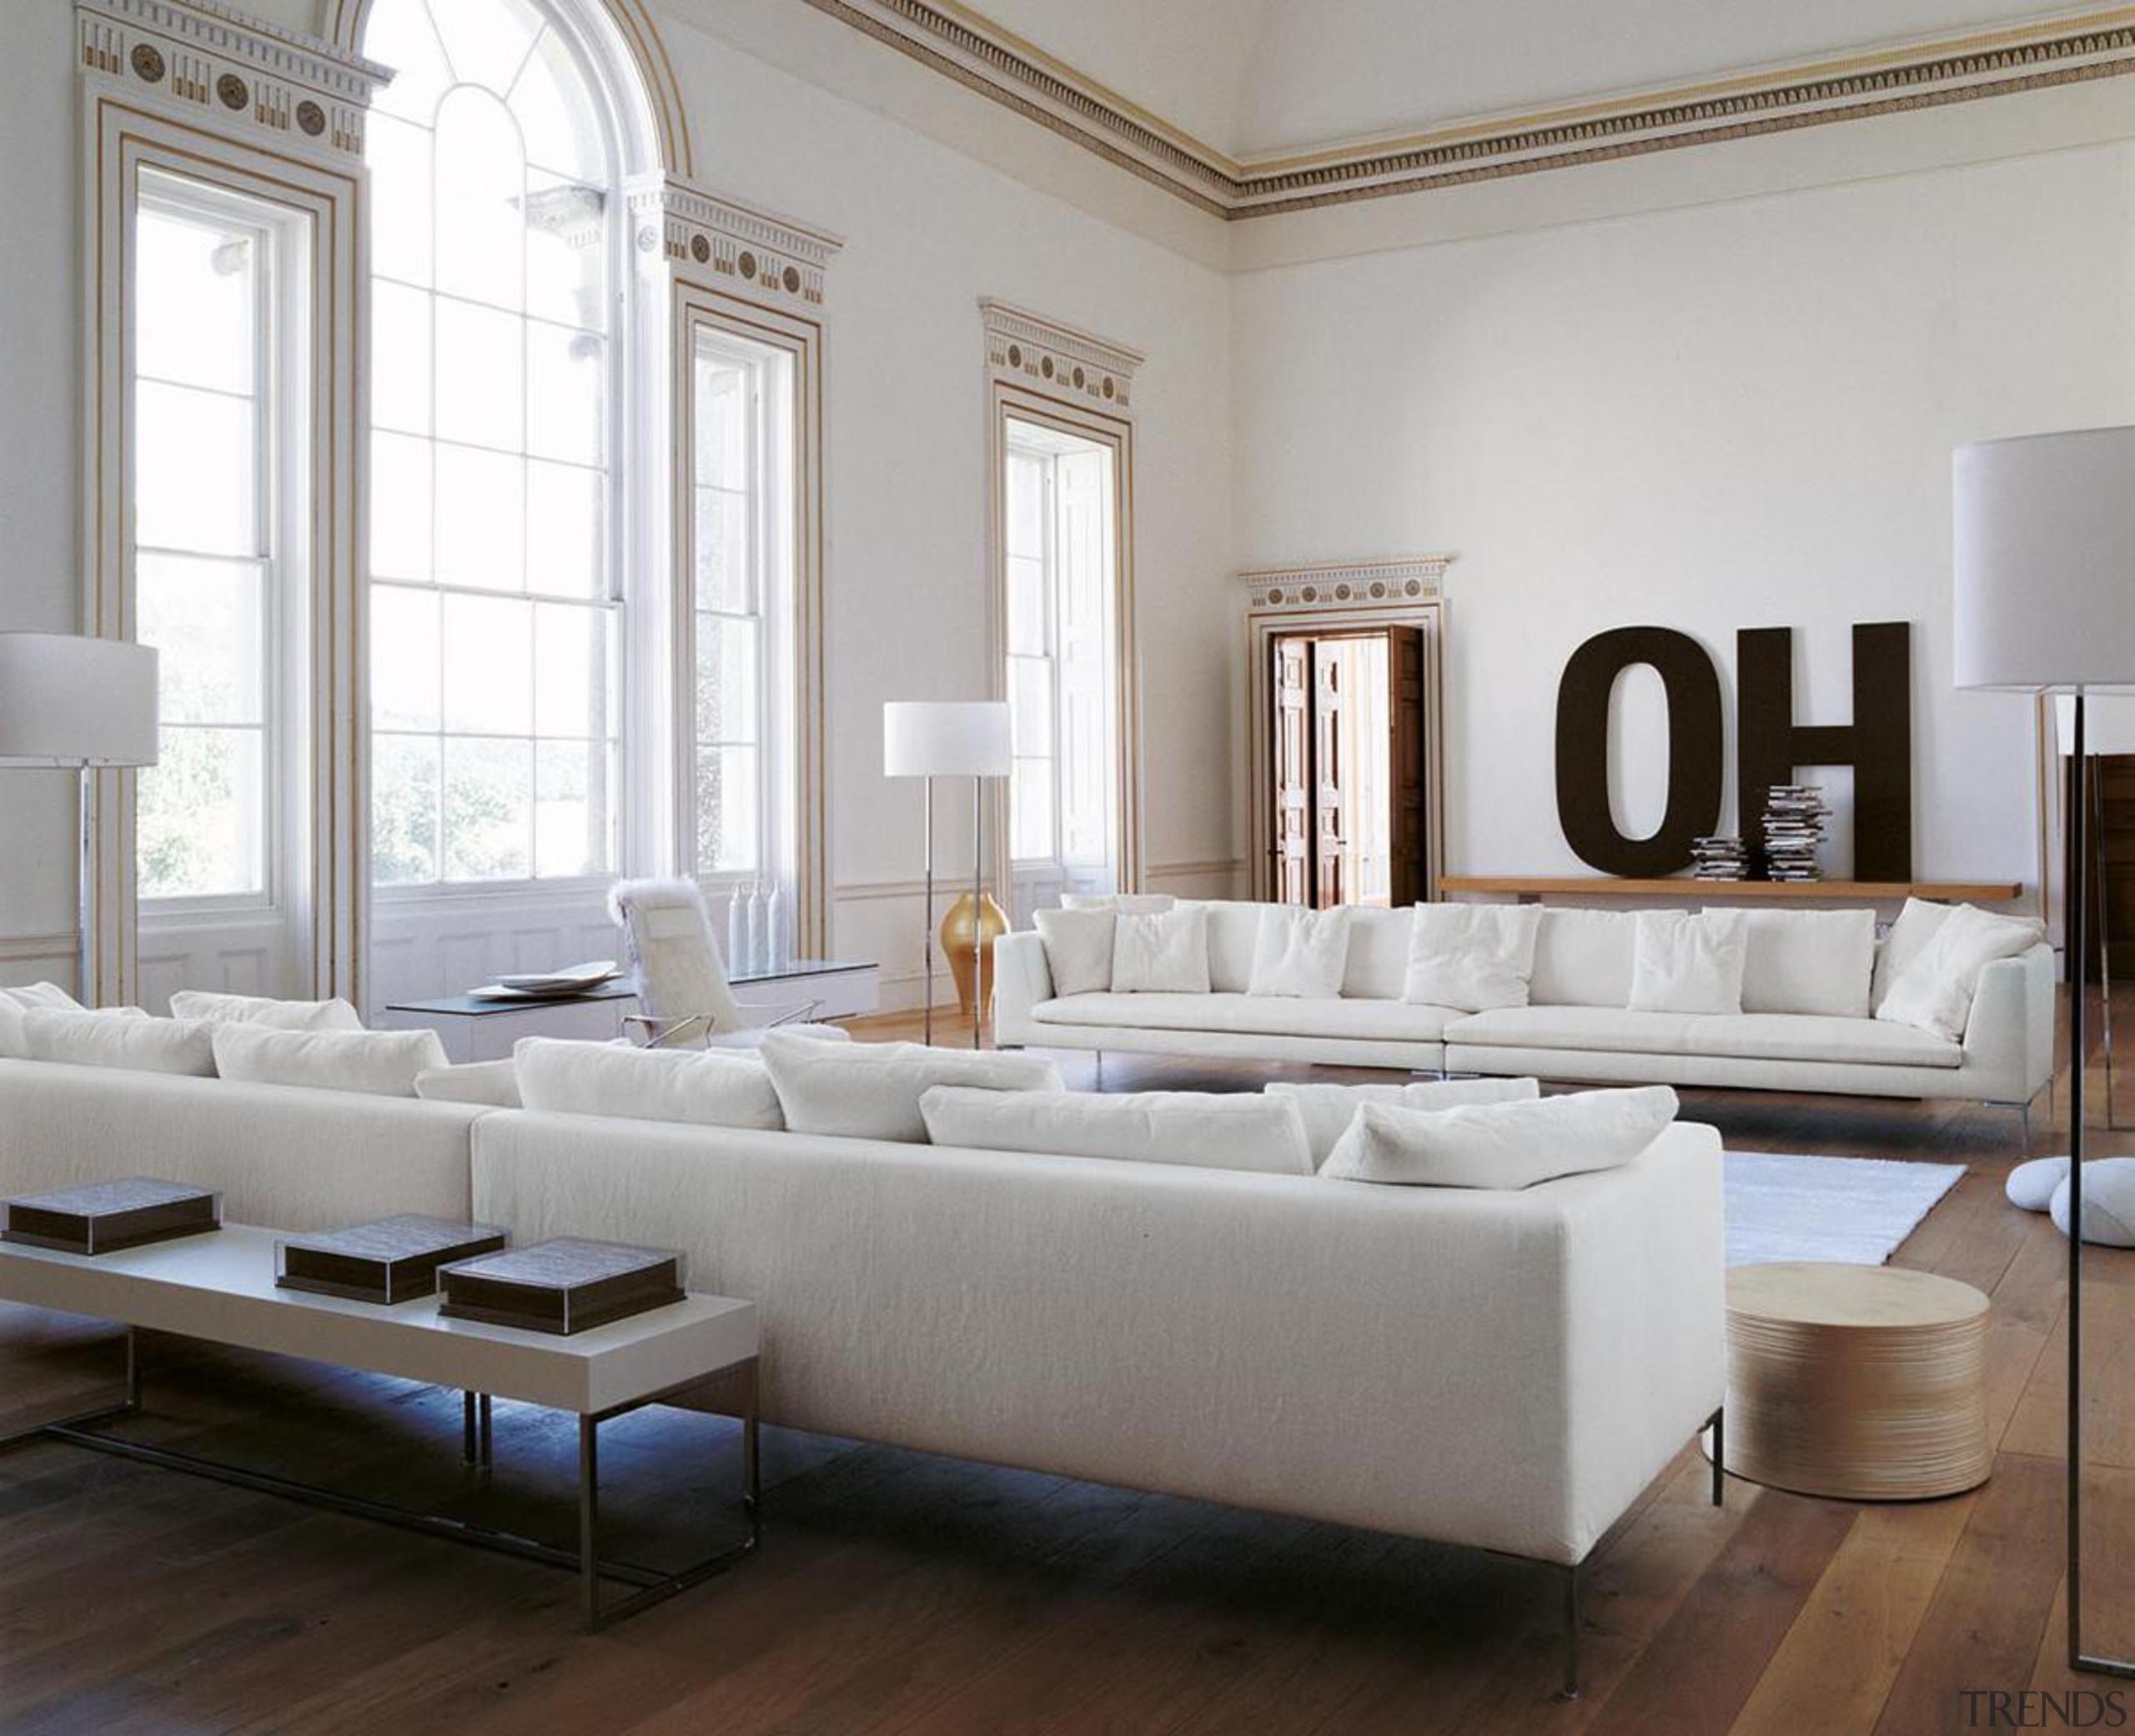 bebitaliacitteriocharleslargesofalightinstu21200.jpg bed frame, coffee table, couch, floor, flooring, furniture, home, interior design, living room, room, table, gray